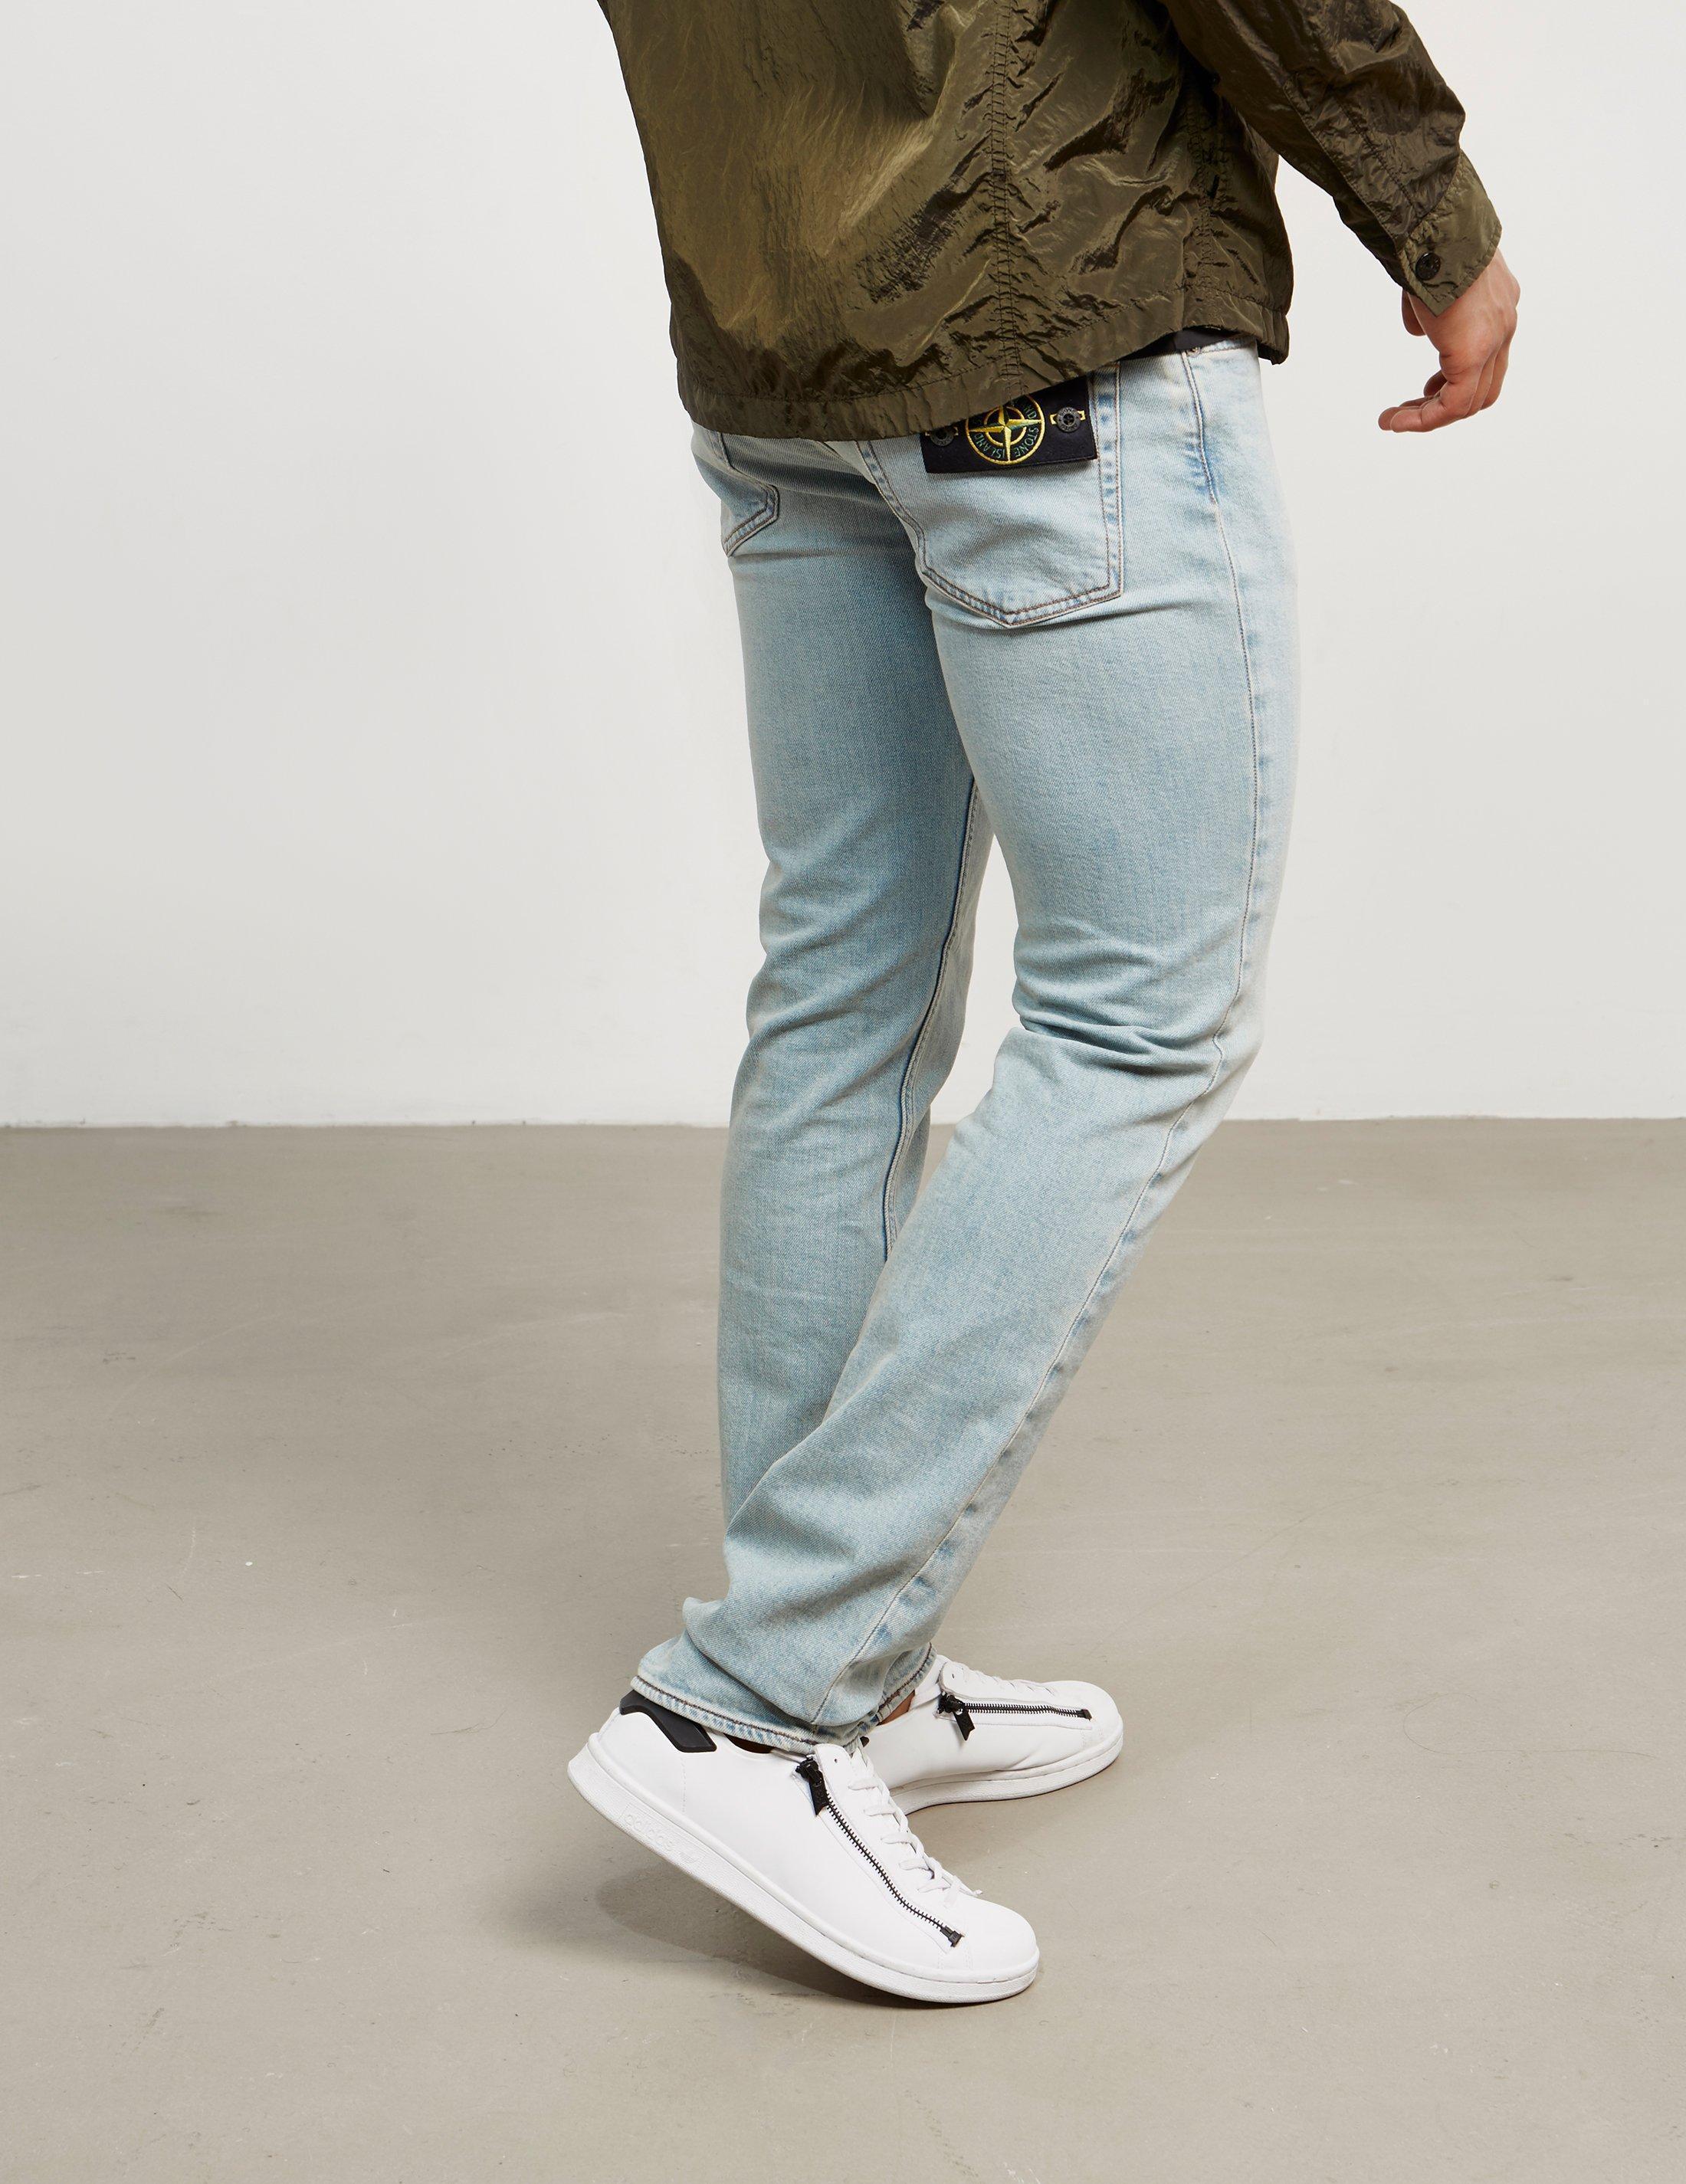 bf3dcfa199 Stone Island Mens Stretch Slim Jeans - Online Exclusive Bleach Blue/bleach  Blue for men